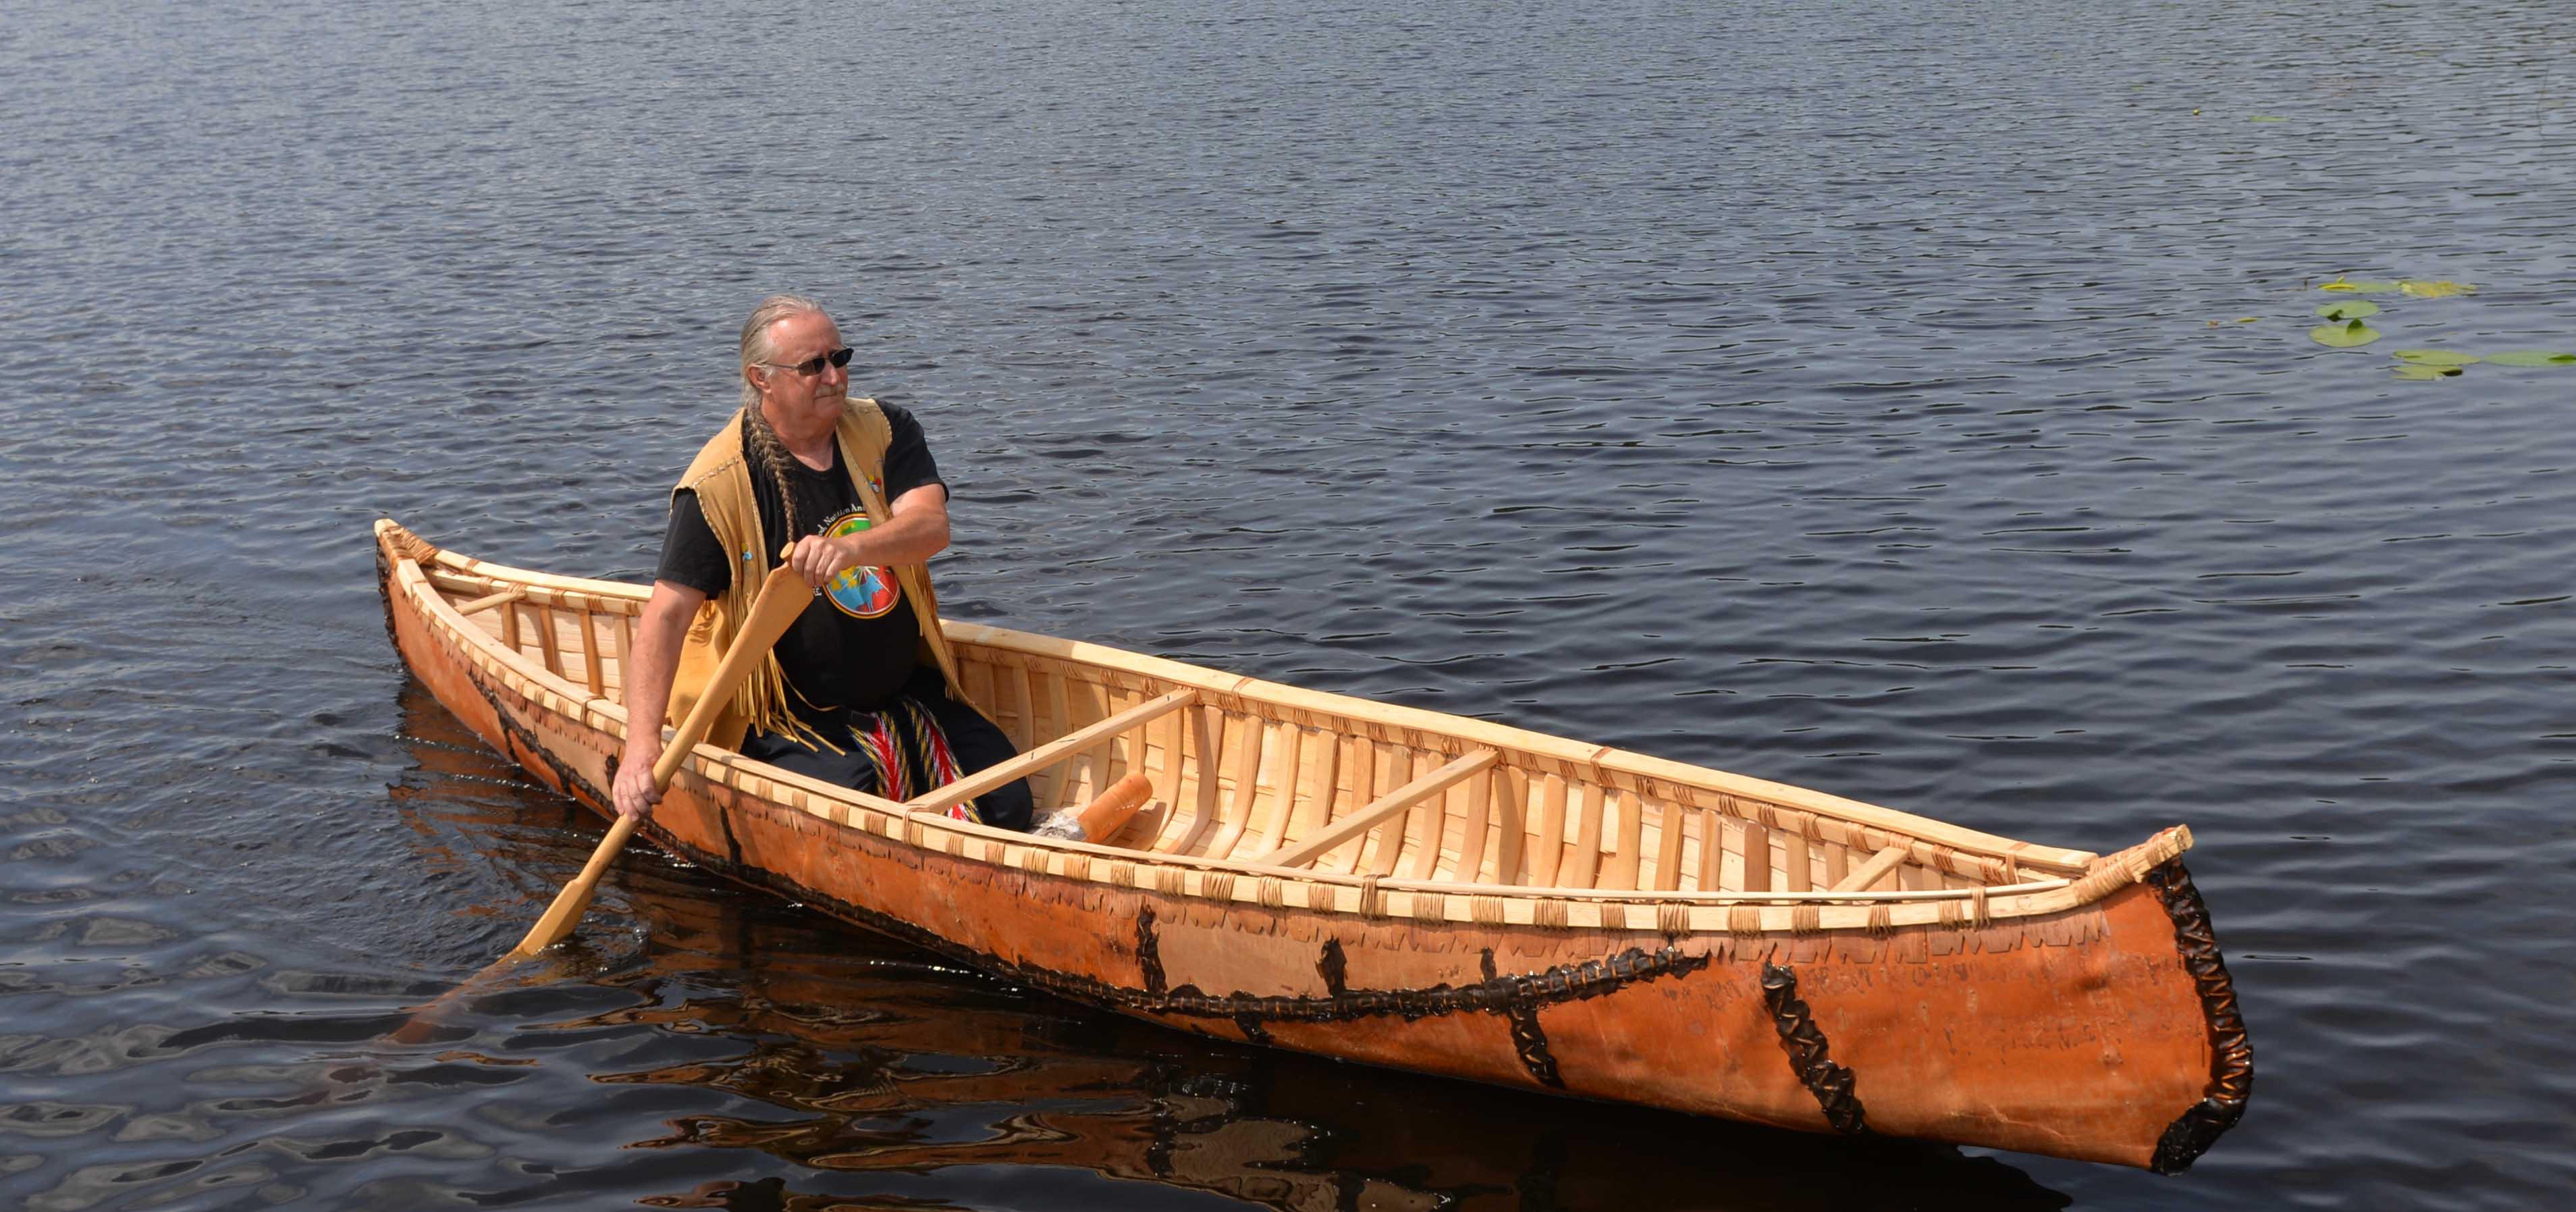 Marcel Labelle paddles the canoe